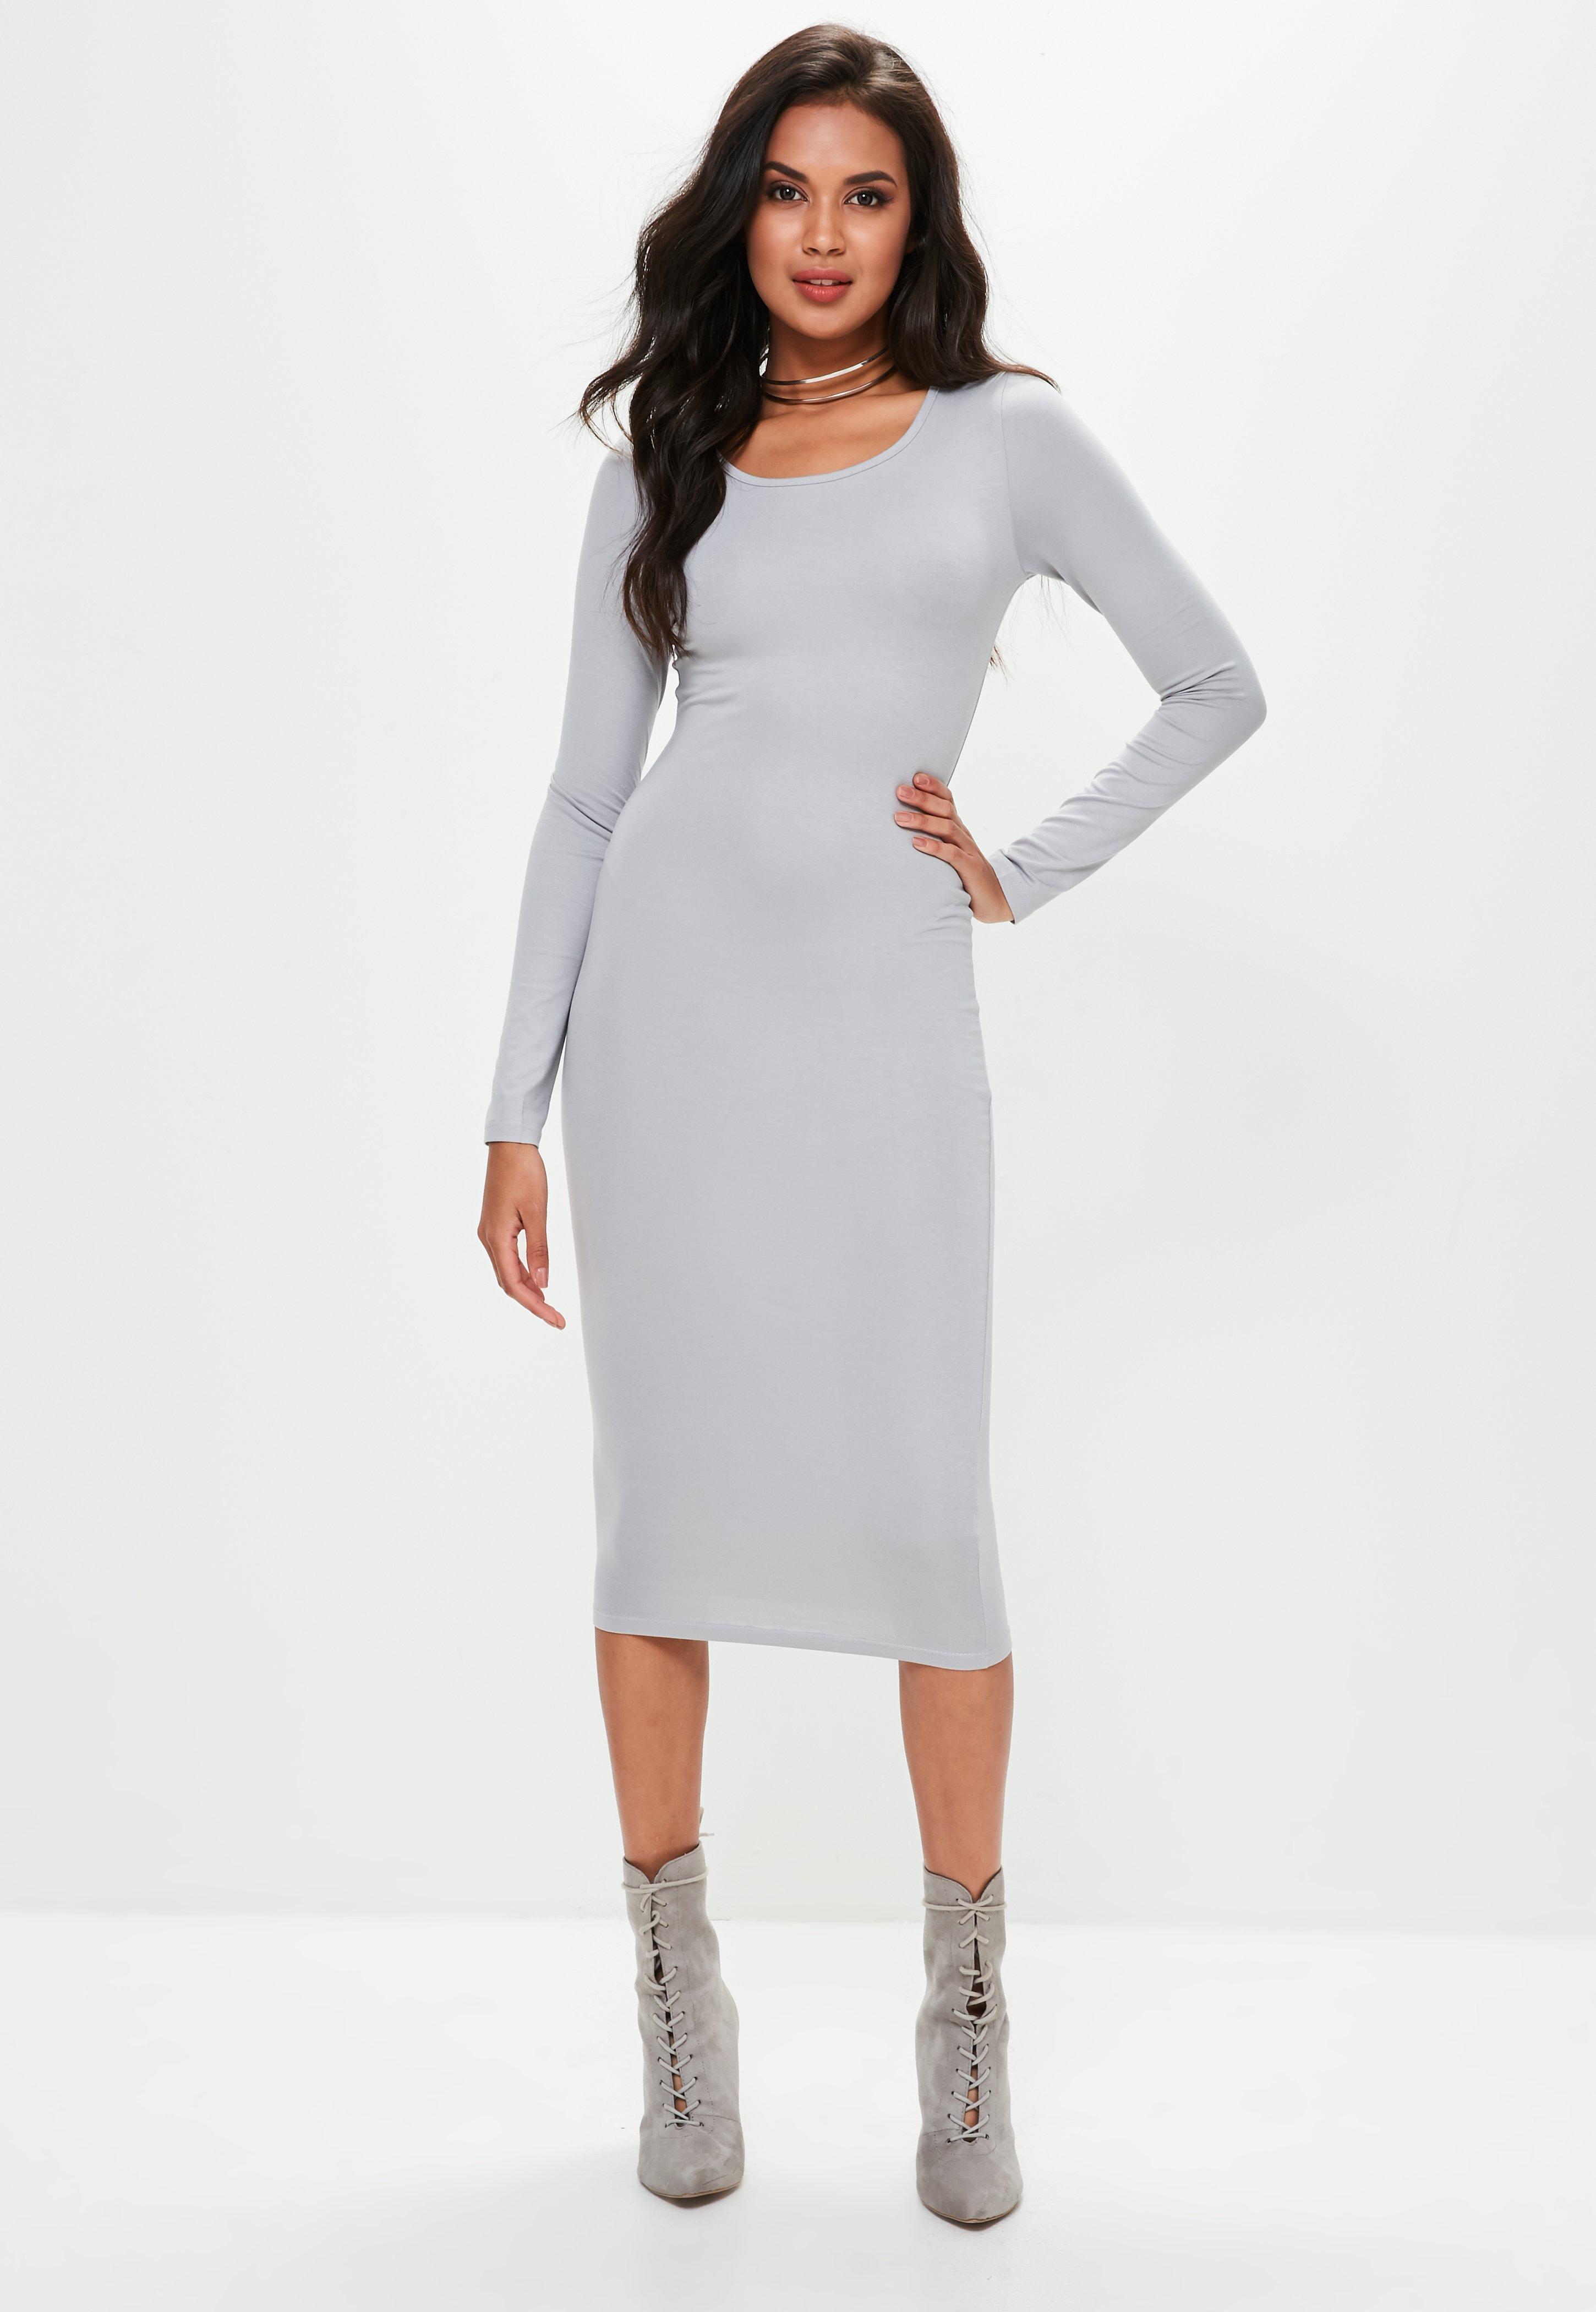 Kleid grau langarm